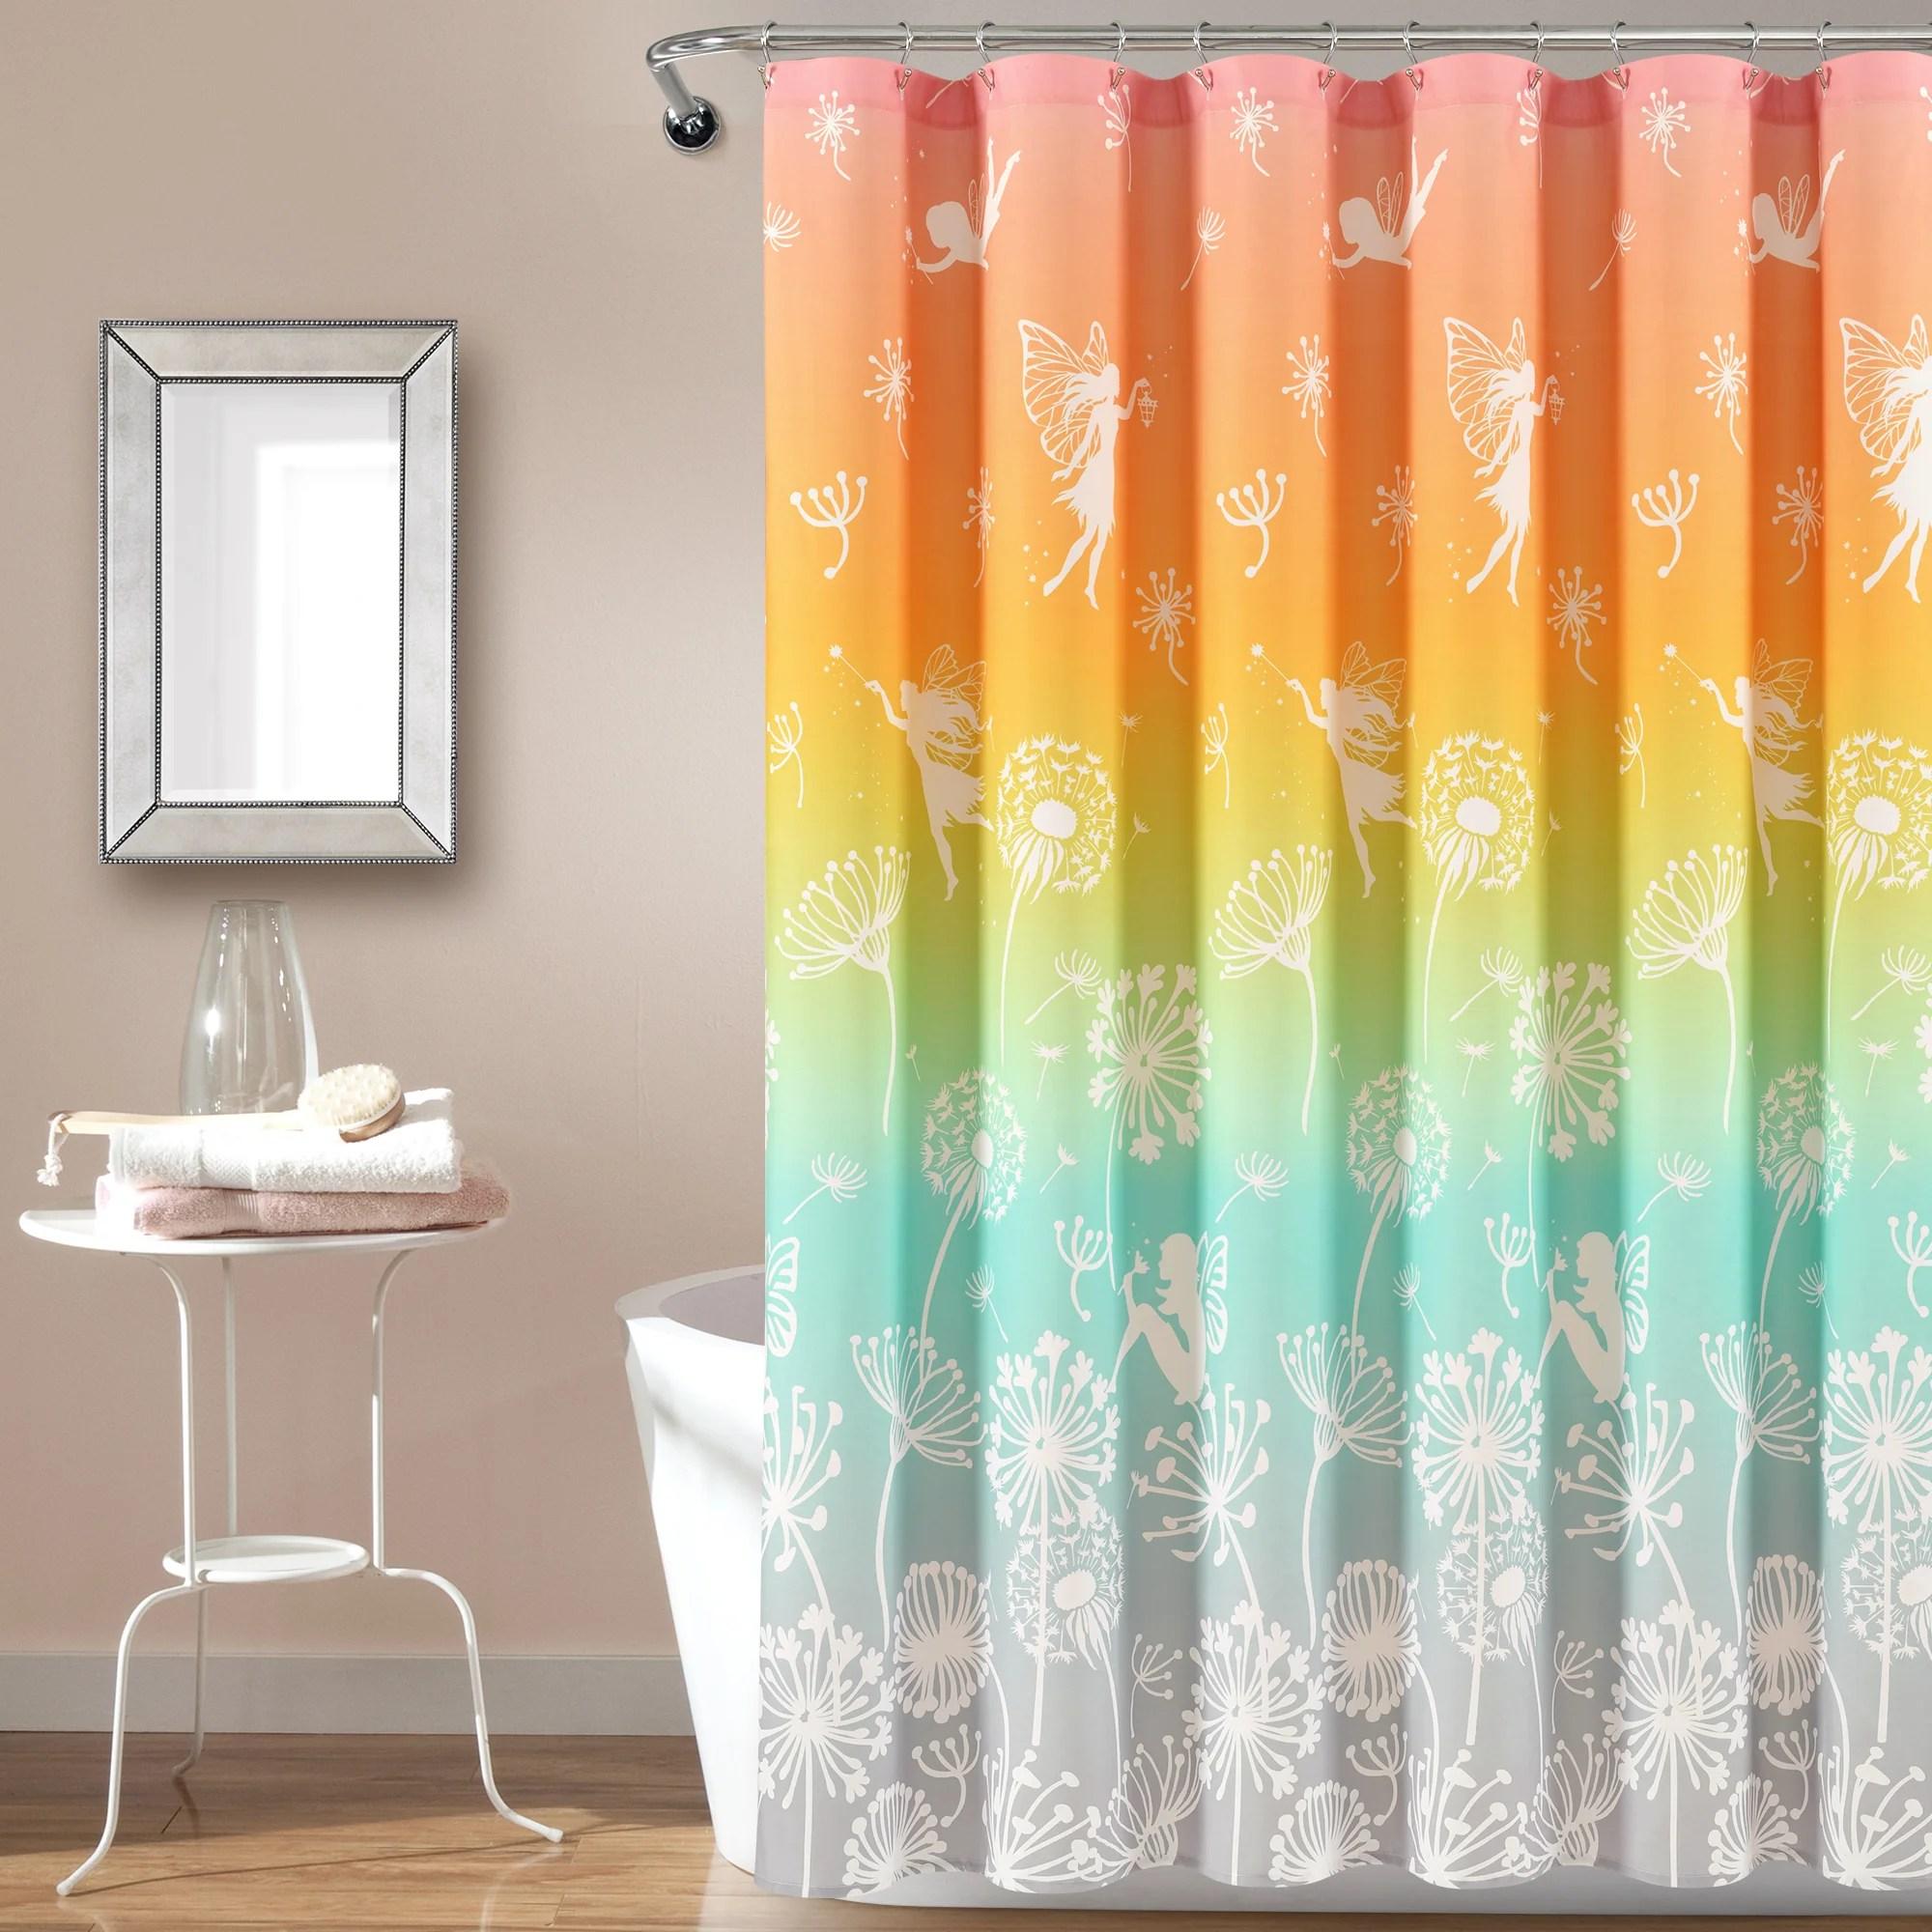 make a wish dandelion fairy ombre shower curtain 72 x 72 pastel rainbow